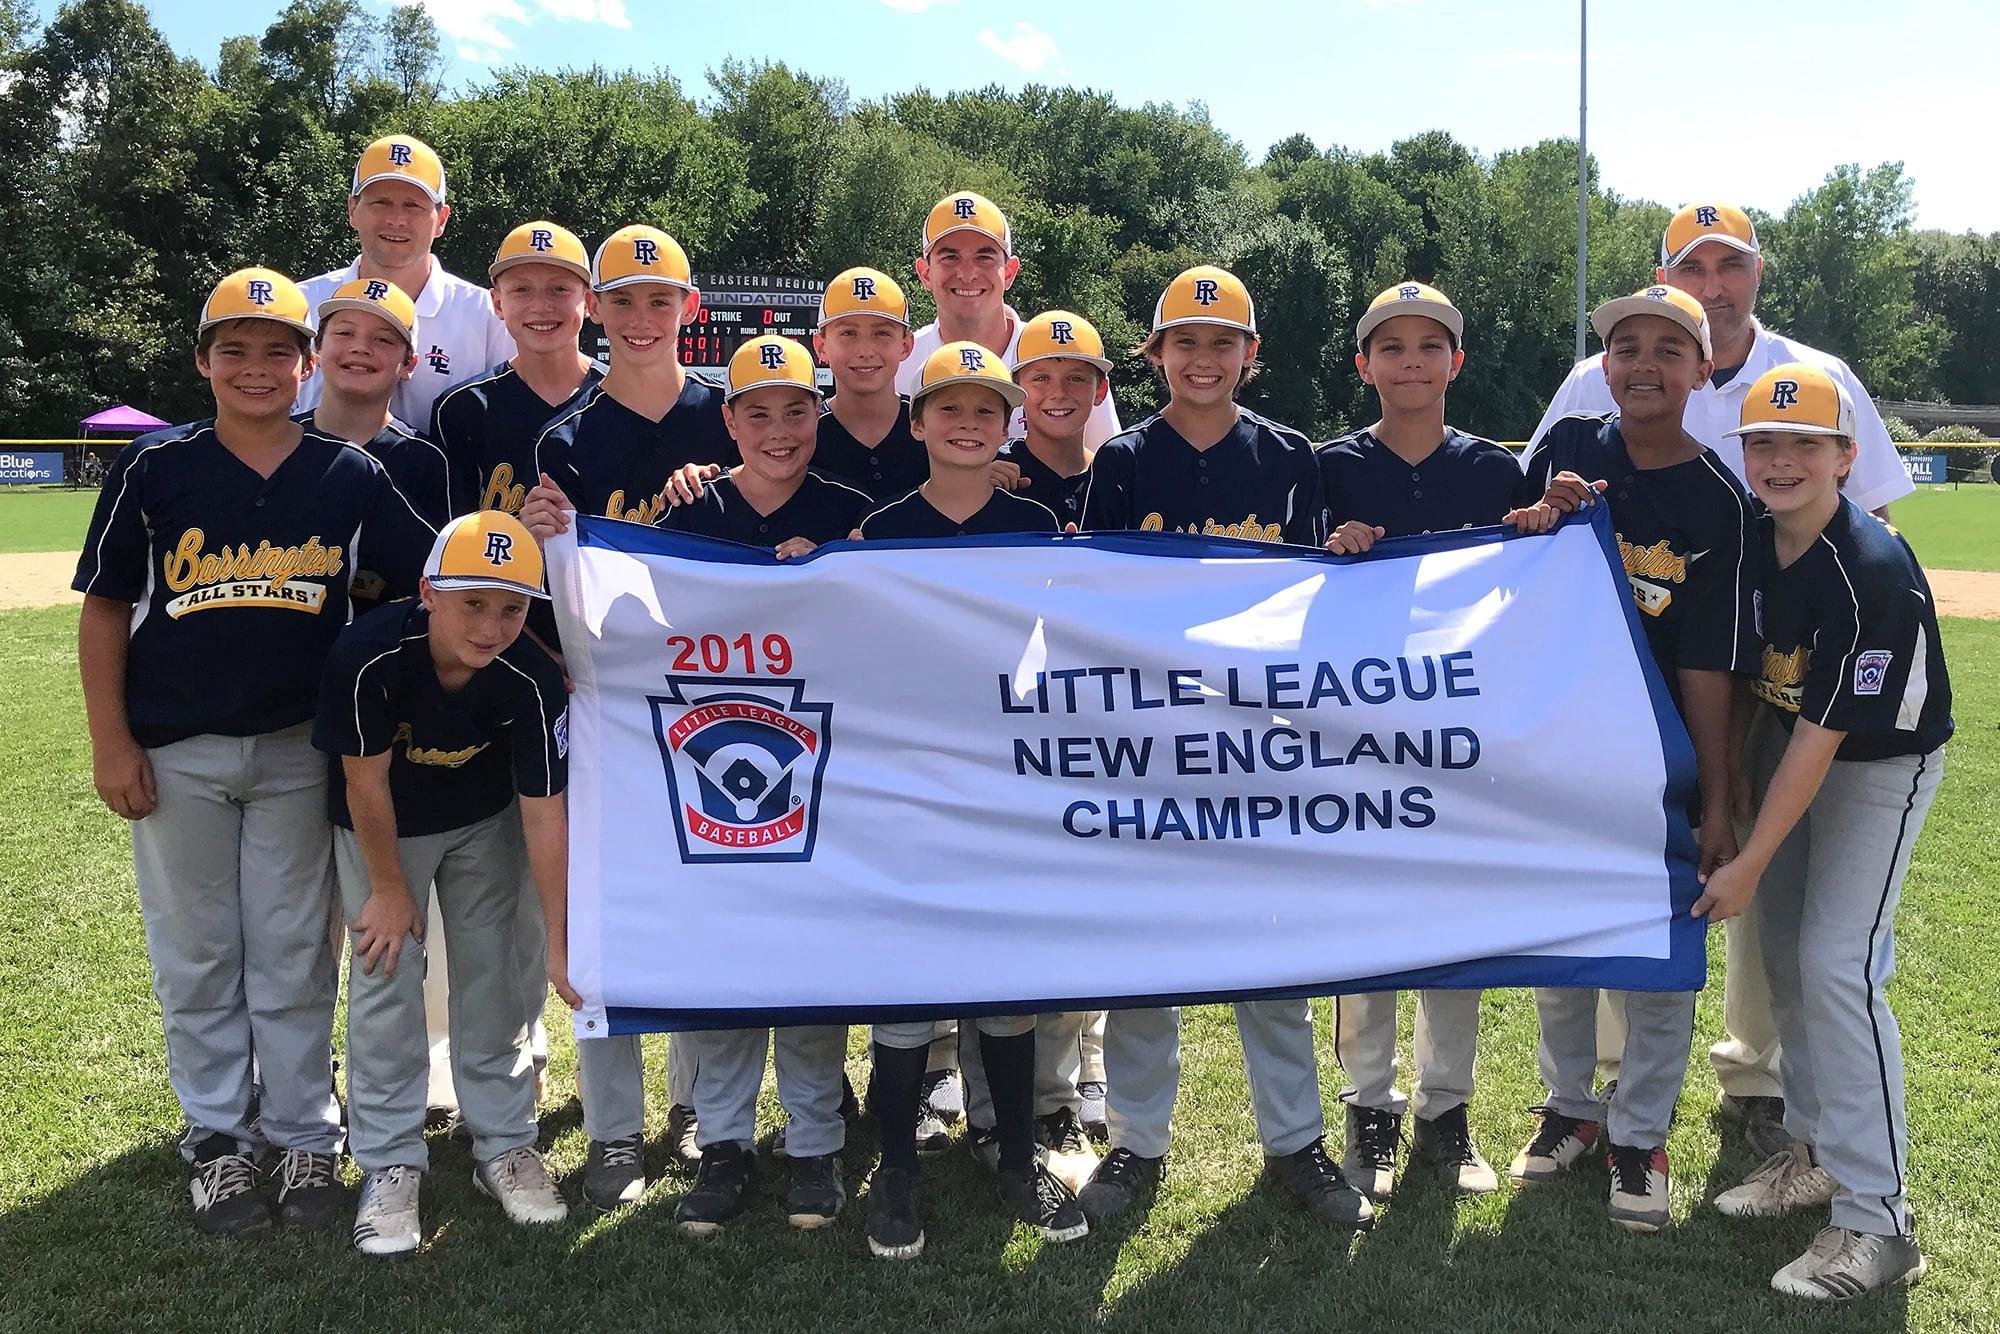 llb-new-england-champs-2019